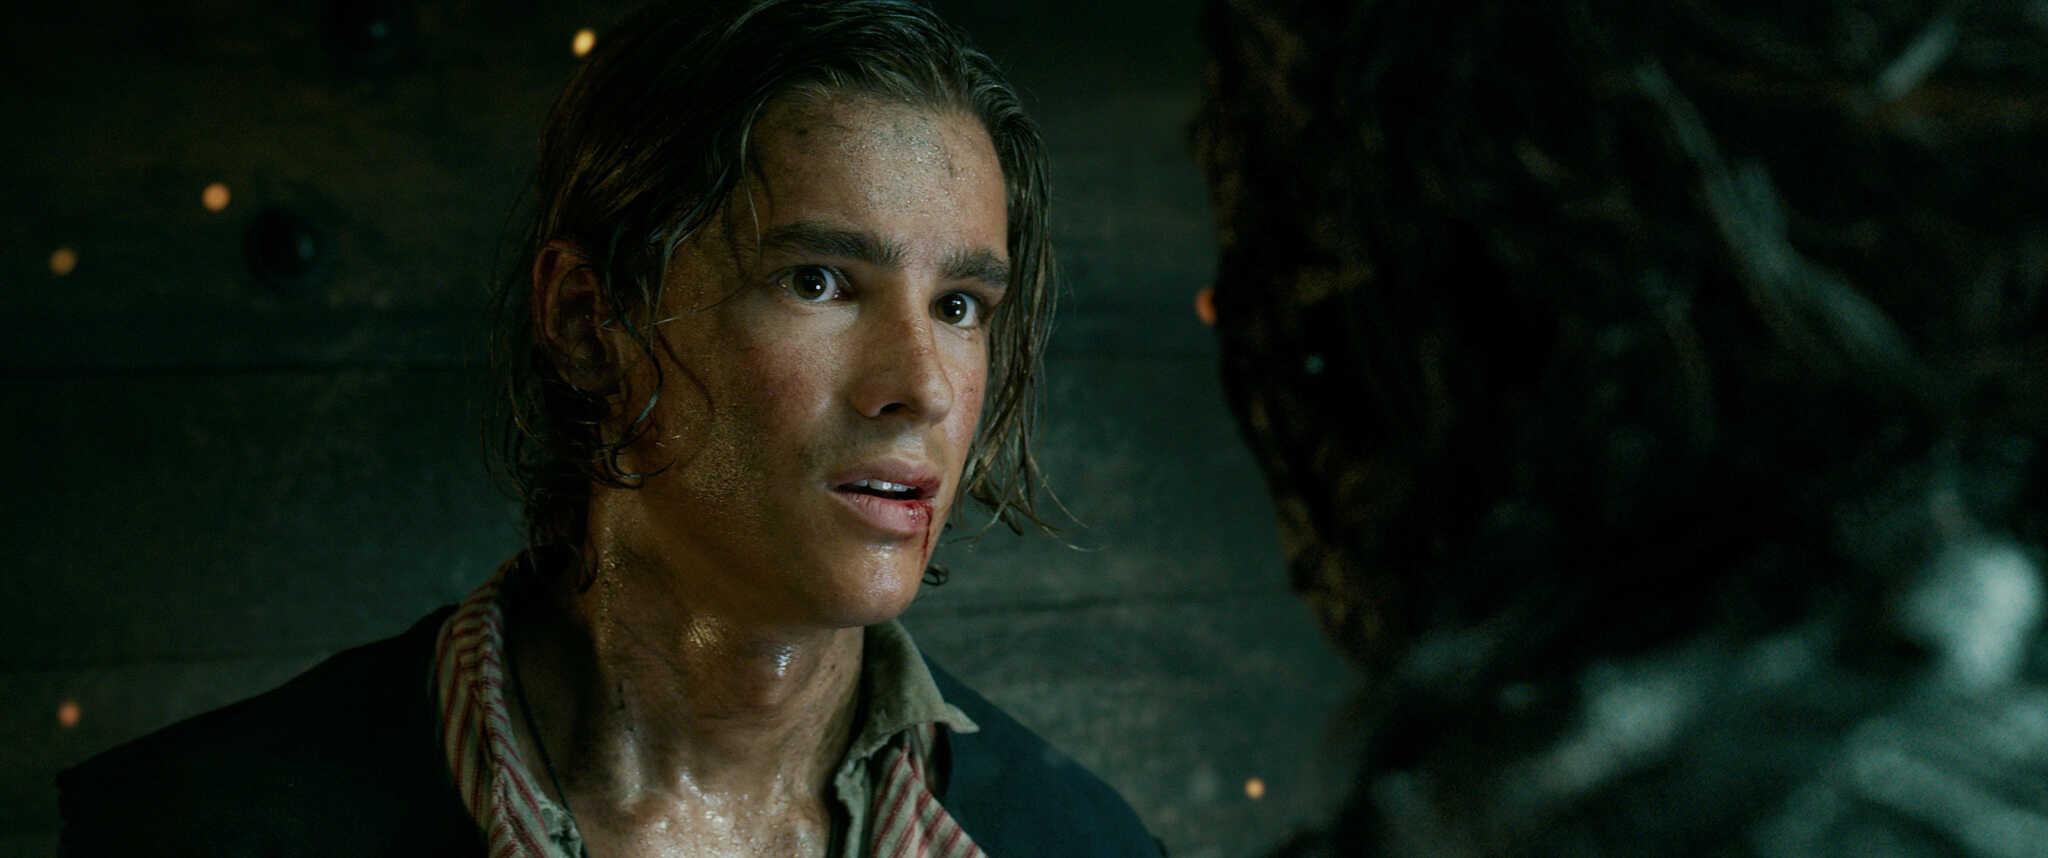 Pirates Of The Caribbean: Dead Men Tell No Tales. #APiratesDeathForMe #PiratesOfTheCaribbean